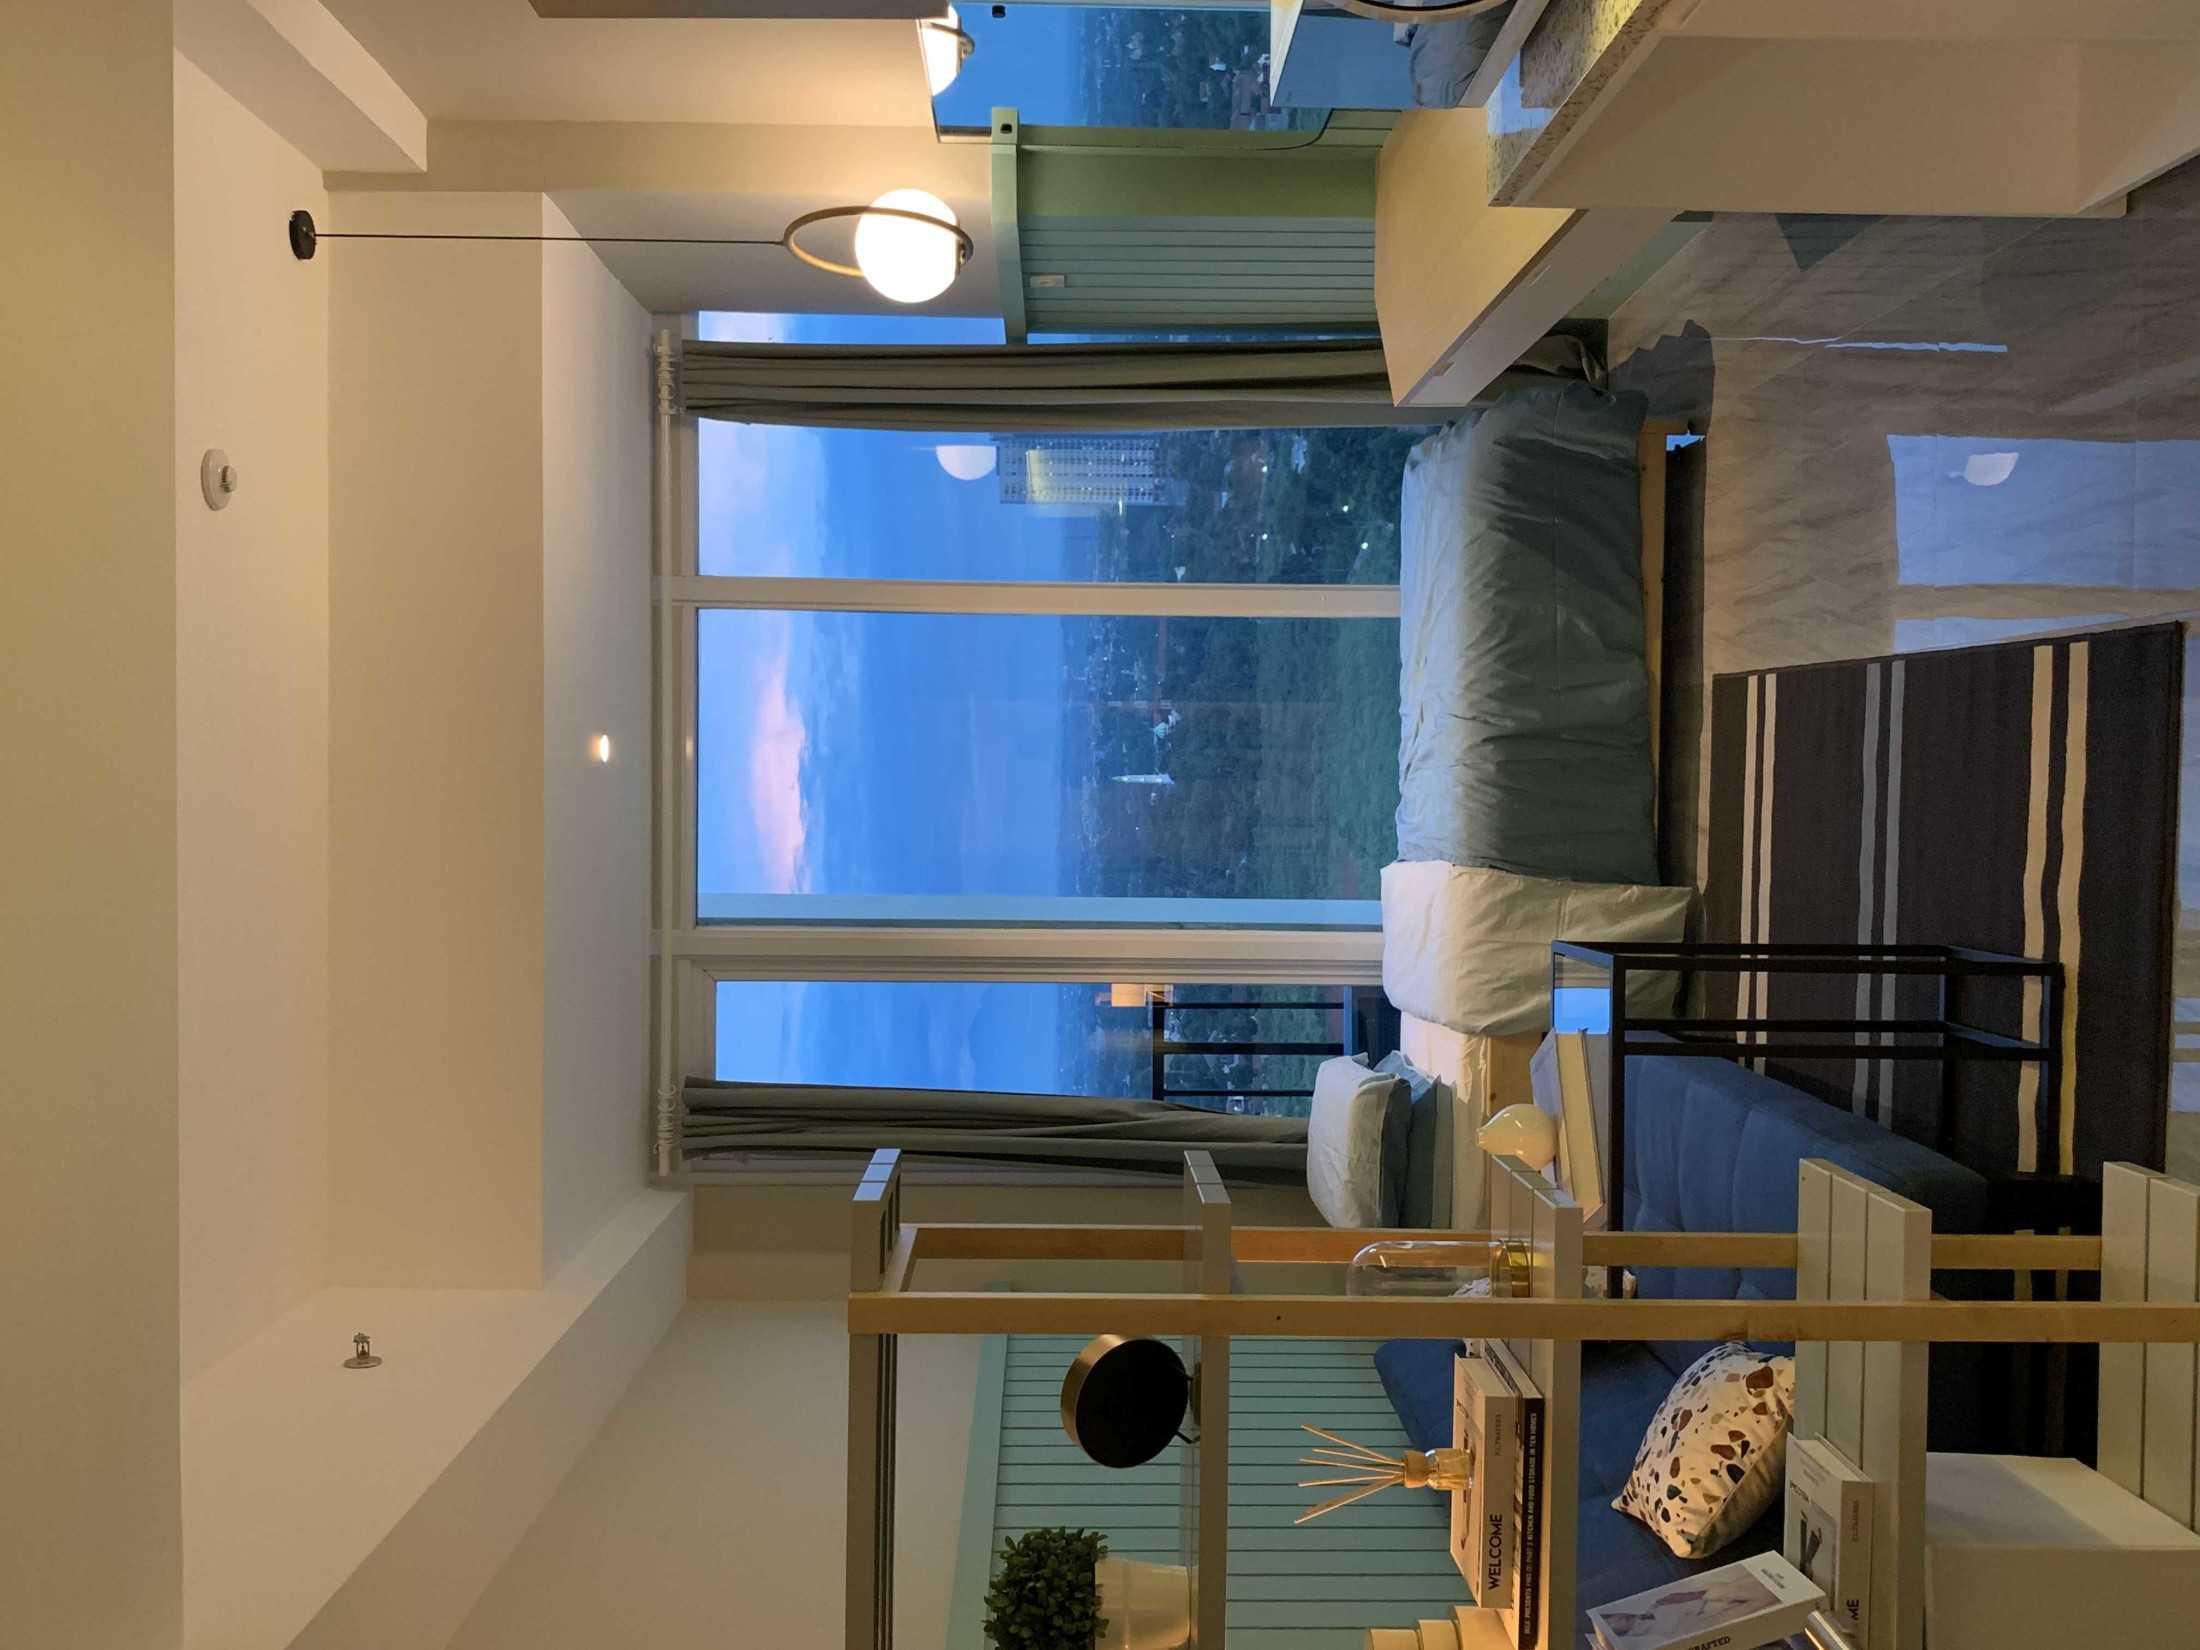 La.casa Treepark Apartment Studio Sunburst Cbd Lot Ii, Jl. Komp. Bsd No.18 C, Lengkong Wetan, Kec. Serpong, Kota Tangerang Selatan, Banten 15322, Indonesia Sunburst Cbd Lot Ii, Jl. Komp. Bsd No.18 C, Lengkong Wetan, Kec. Serpong, Kota Tangerang Selatan, Banten 15322, Indonesia Lacasa-Treepark-Apartment-Studio  84217